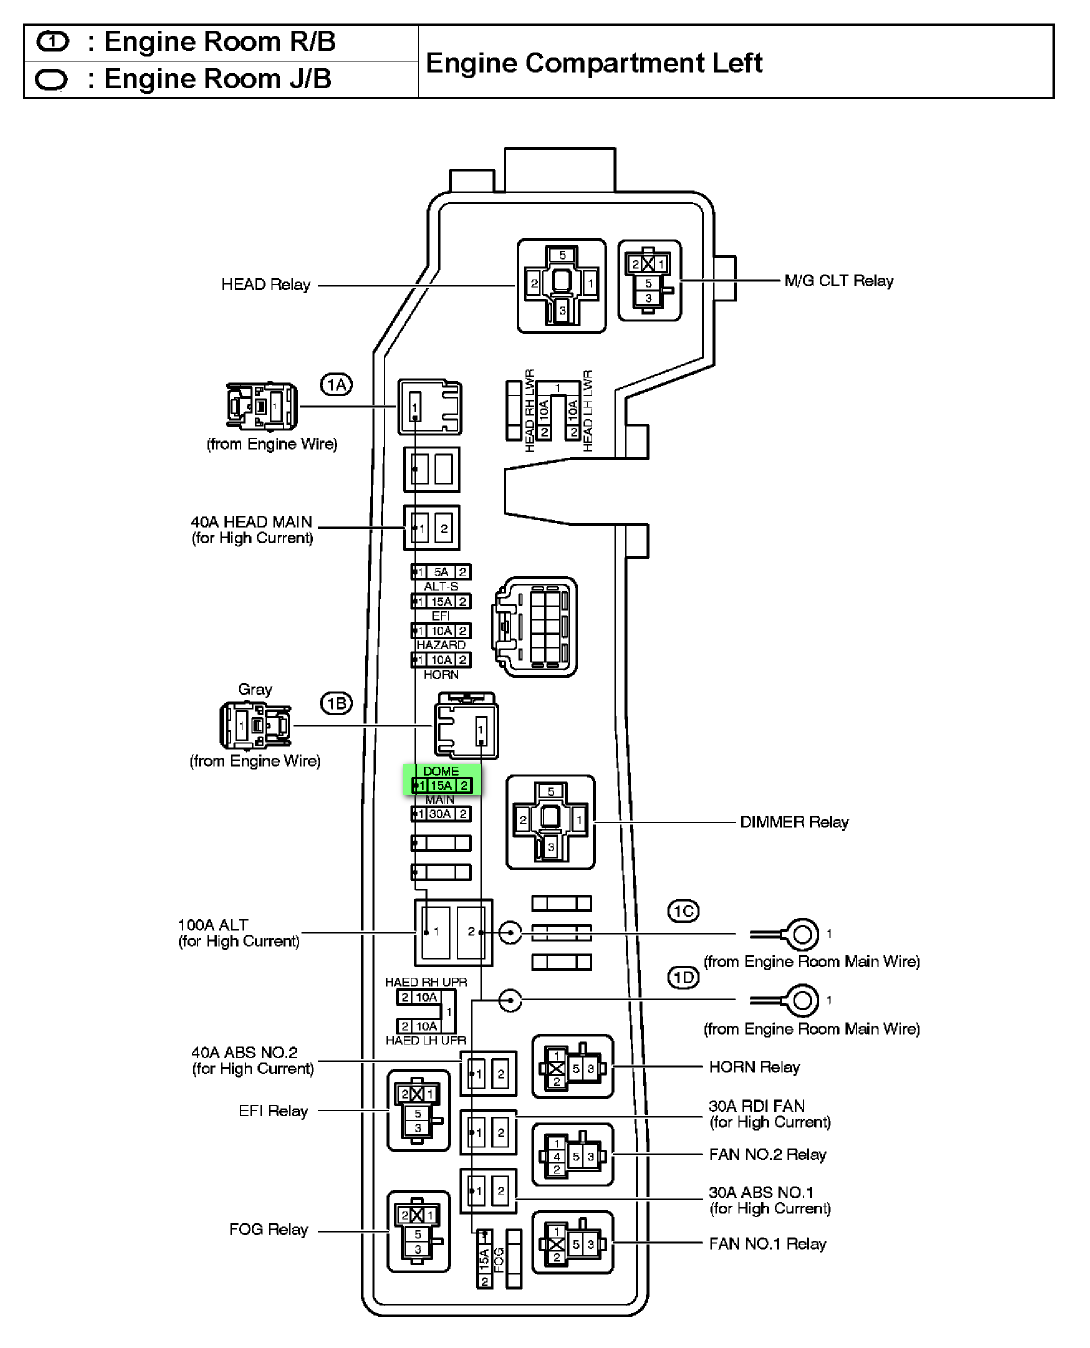 1999 toyota corolla wiring diagram radio where to shoot a deer with rifle fuse box manual e books 20 schwabenschamanen de u2022corolla eeu schullieder u2022